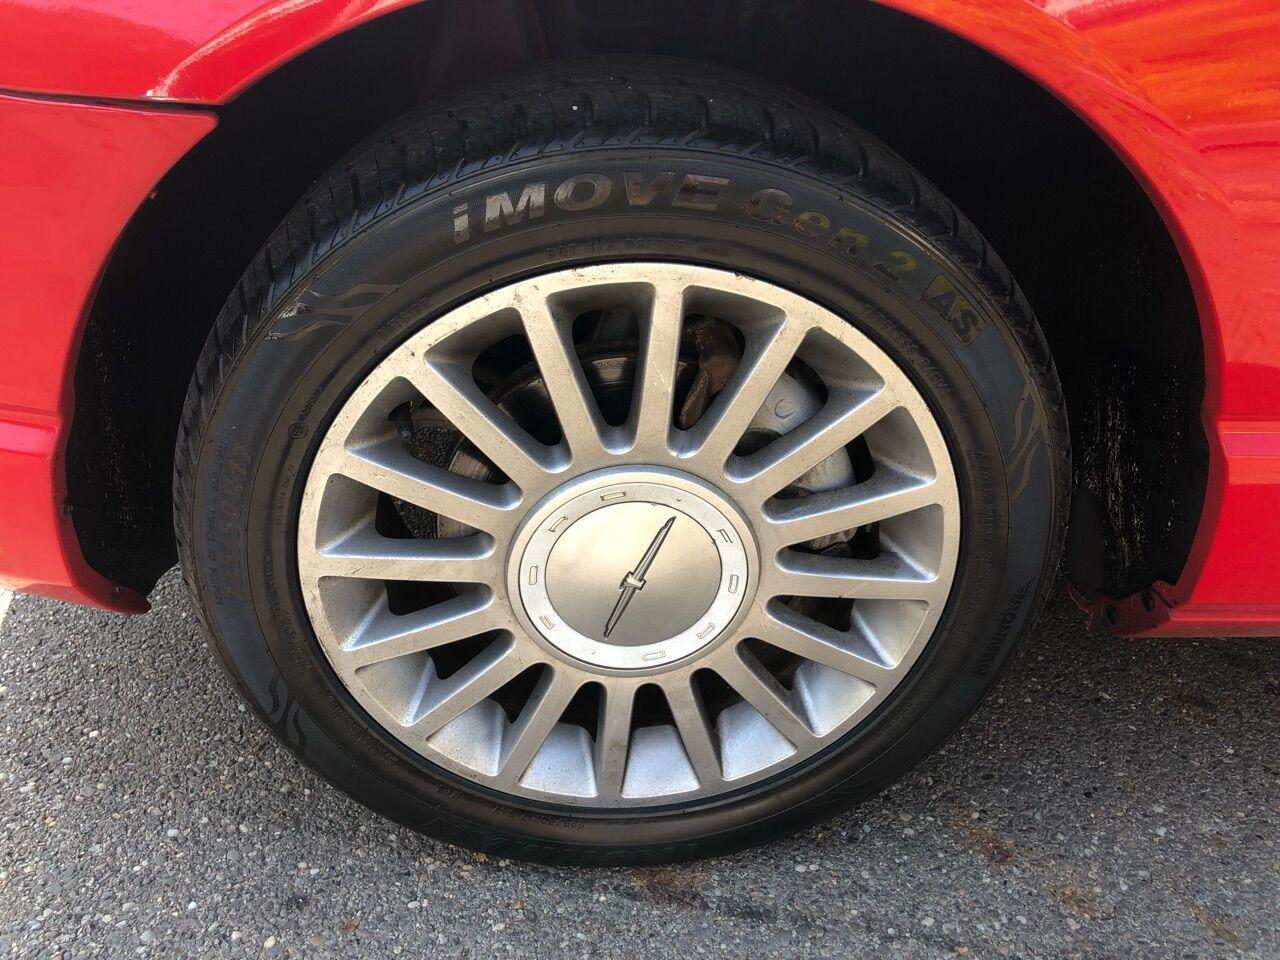 2005 Ford Thunderbird Convertible